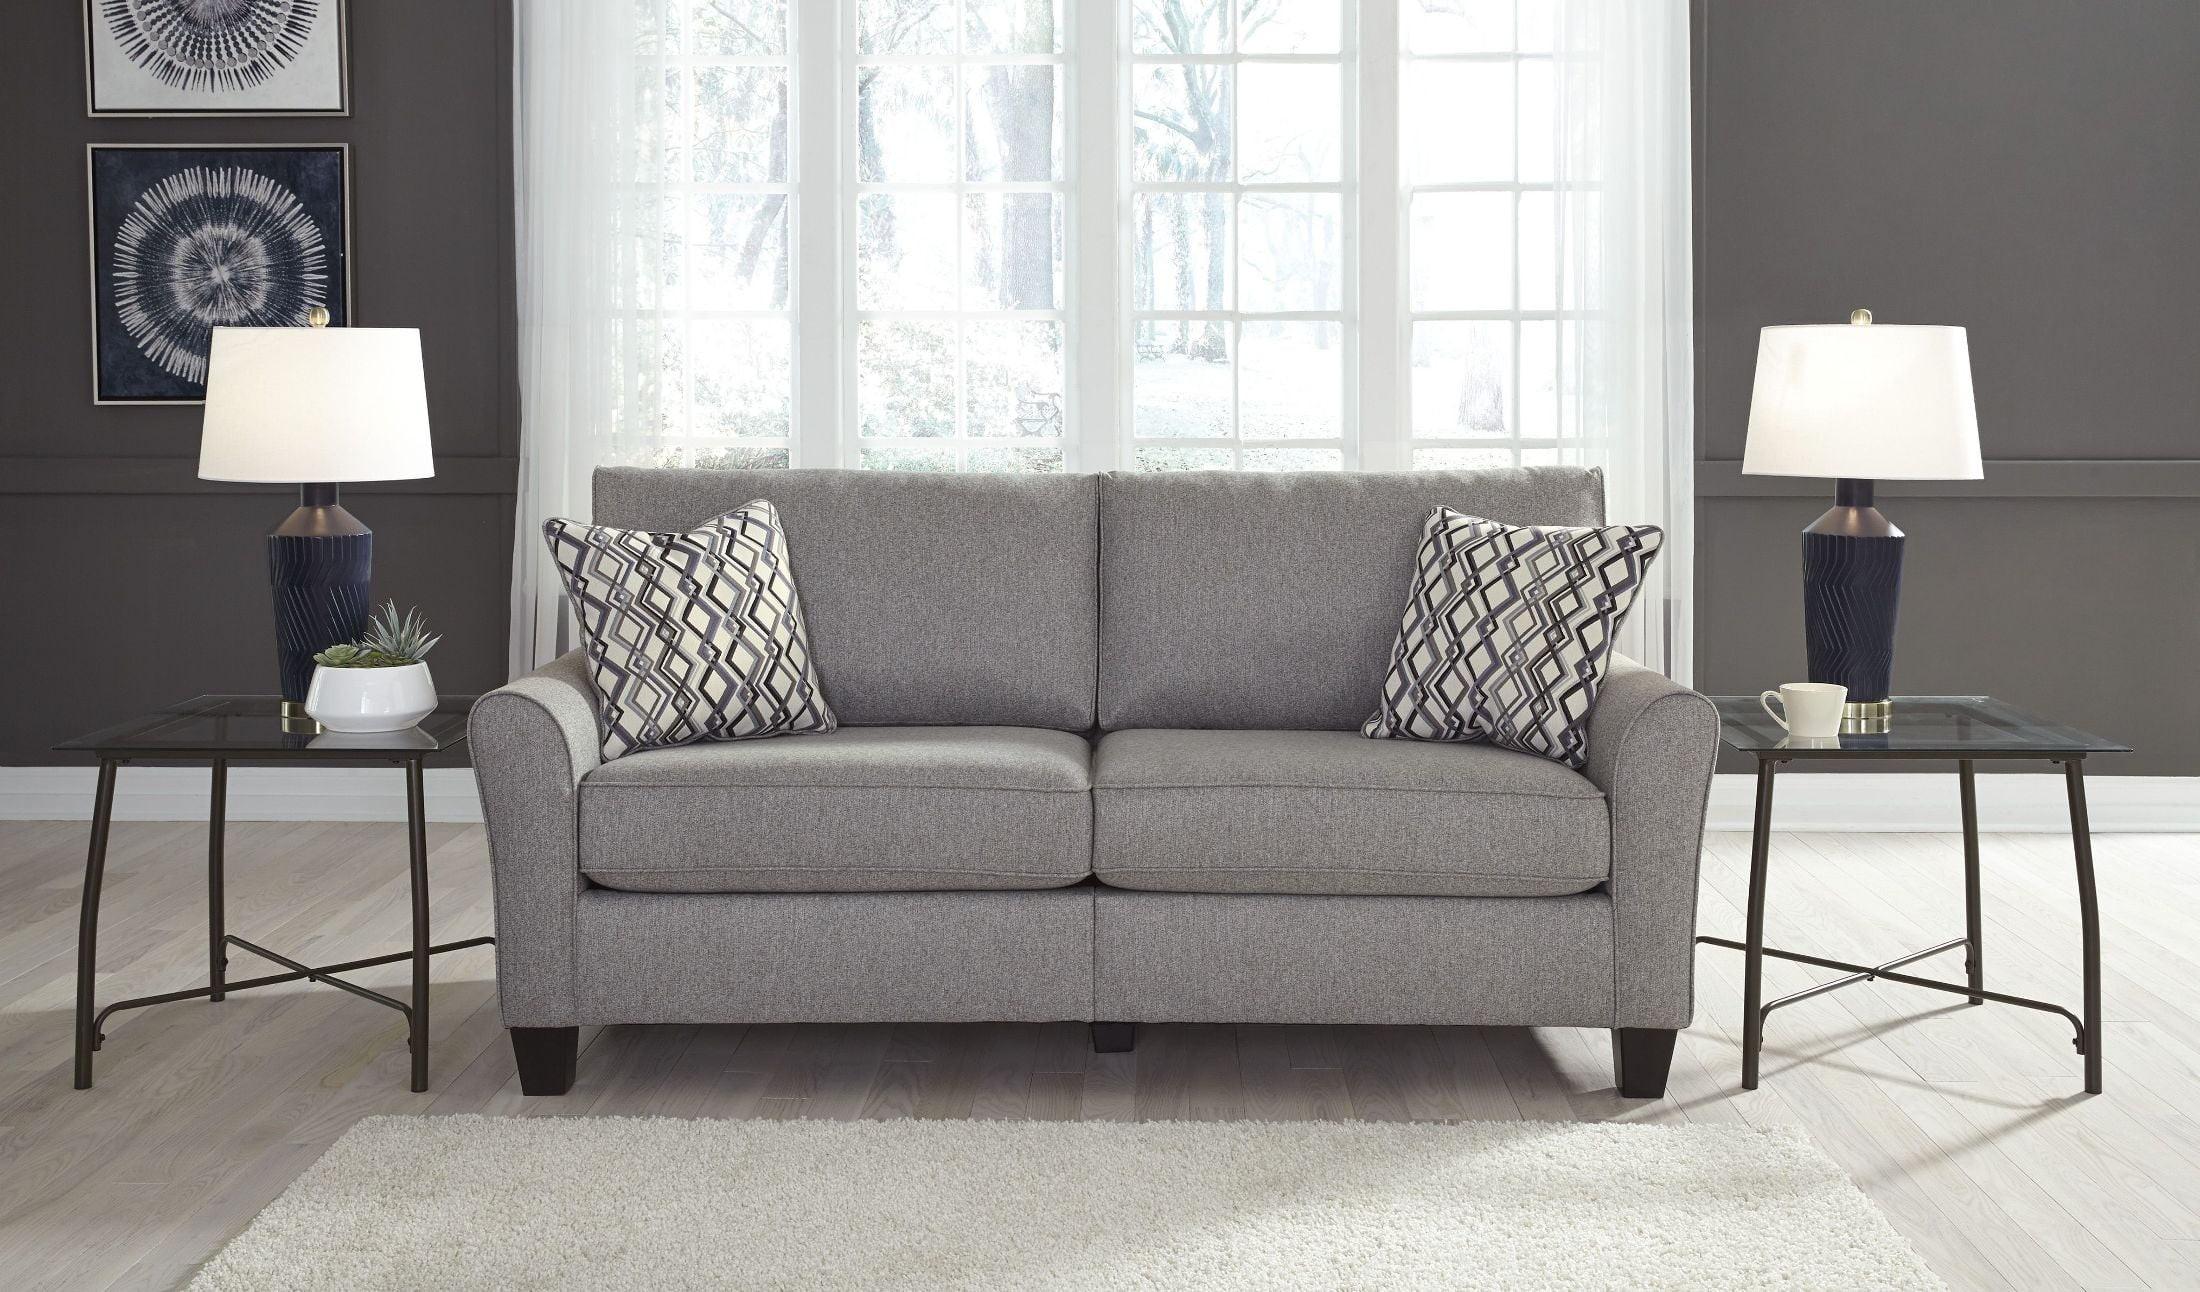 Marvelous Strehela Silver Sofa